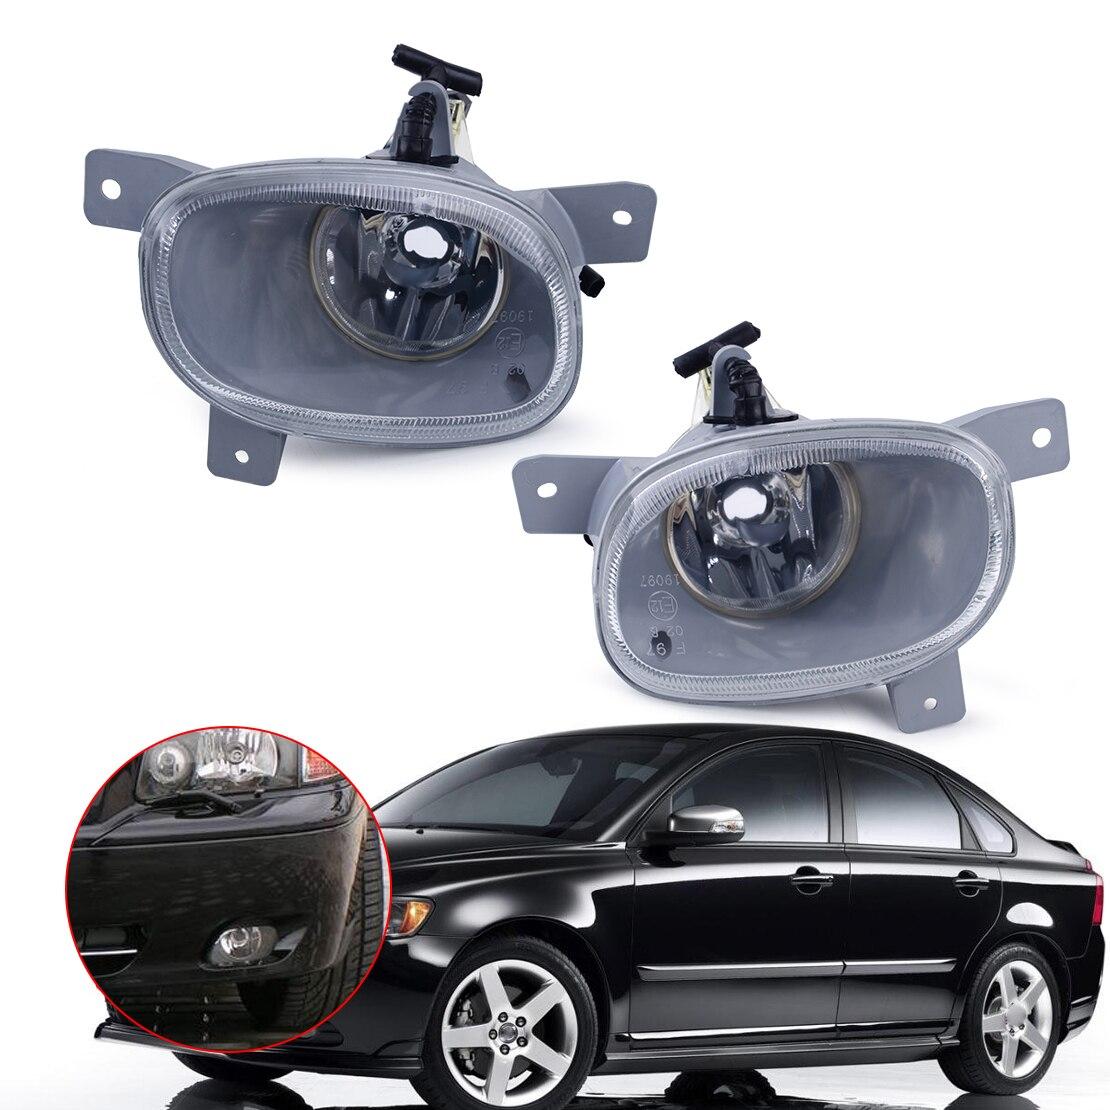 купить CITALL 1Pc Left Right Front Bumper Fog Light Lamp Fit For Volvo S80 1999 2000 2001 2002 2003 2004 2005 2006 8620224 8620225 по цене 1570.06 рублей